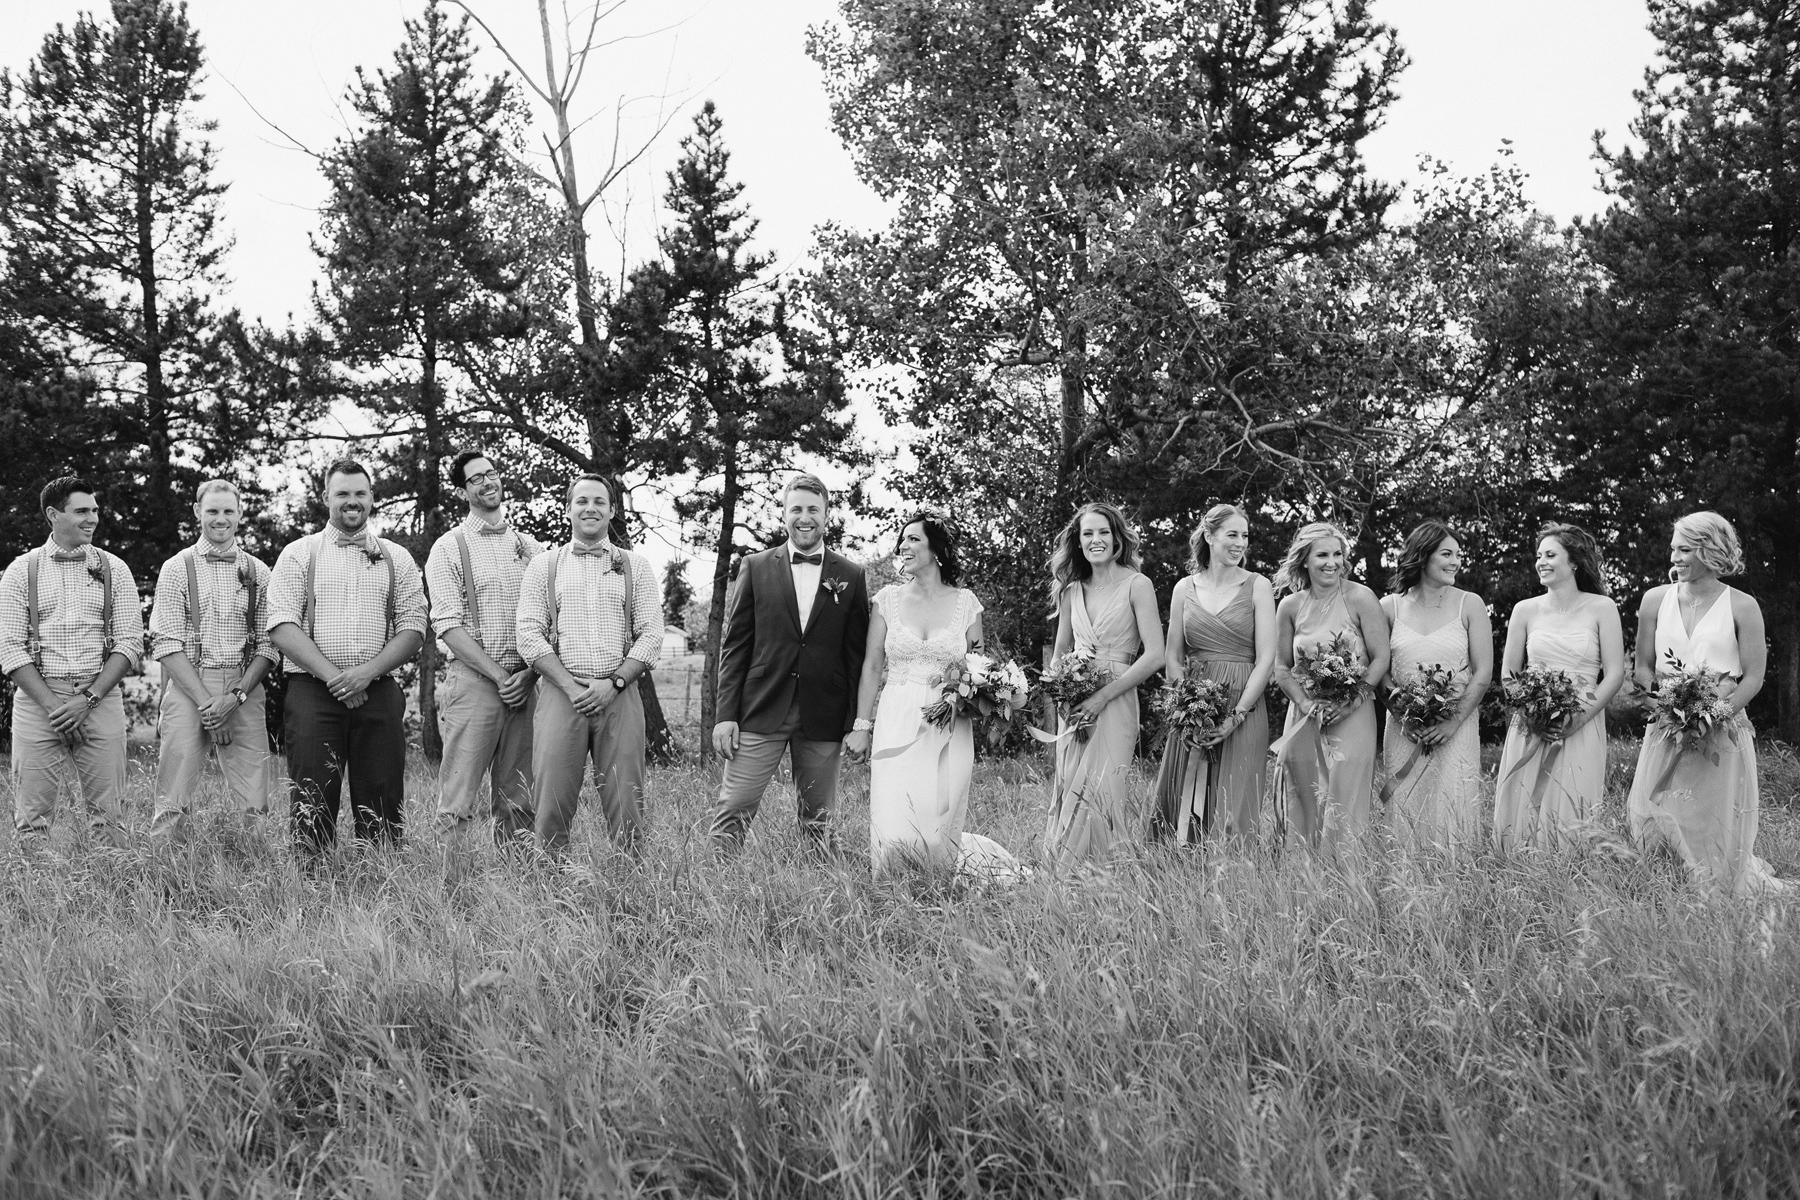 alberta-farm-wedding-photographer-rp-wj-063.jpg